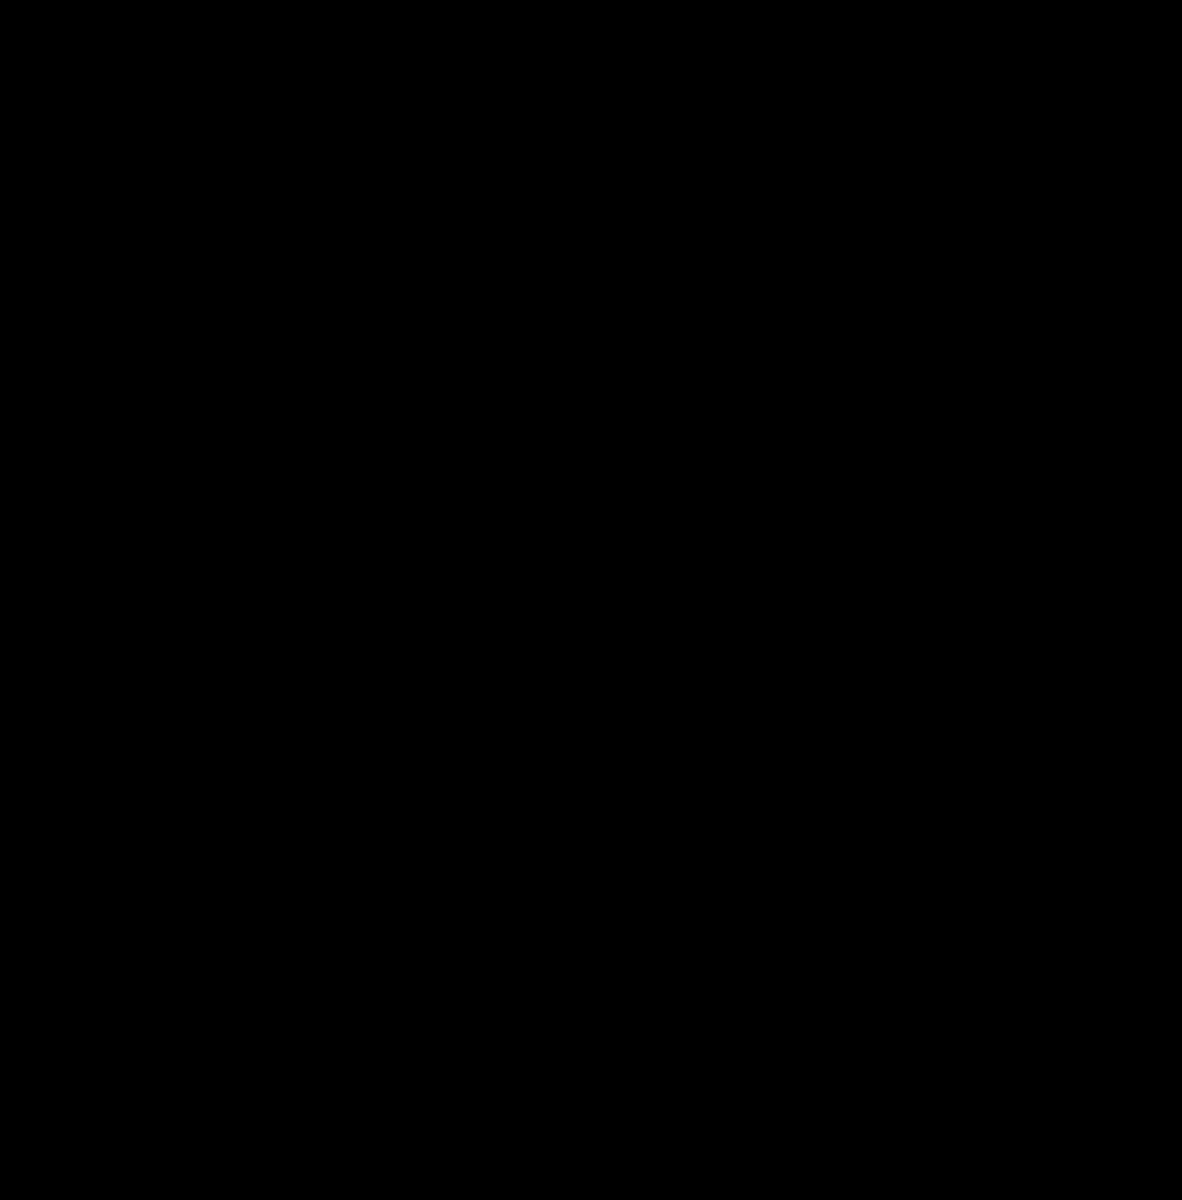 Mini USB-fan met klok – Lampje met tijdsaanwijzing – 9cm diameter